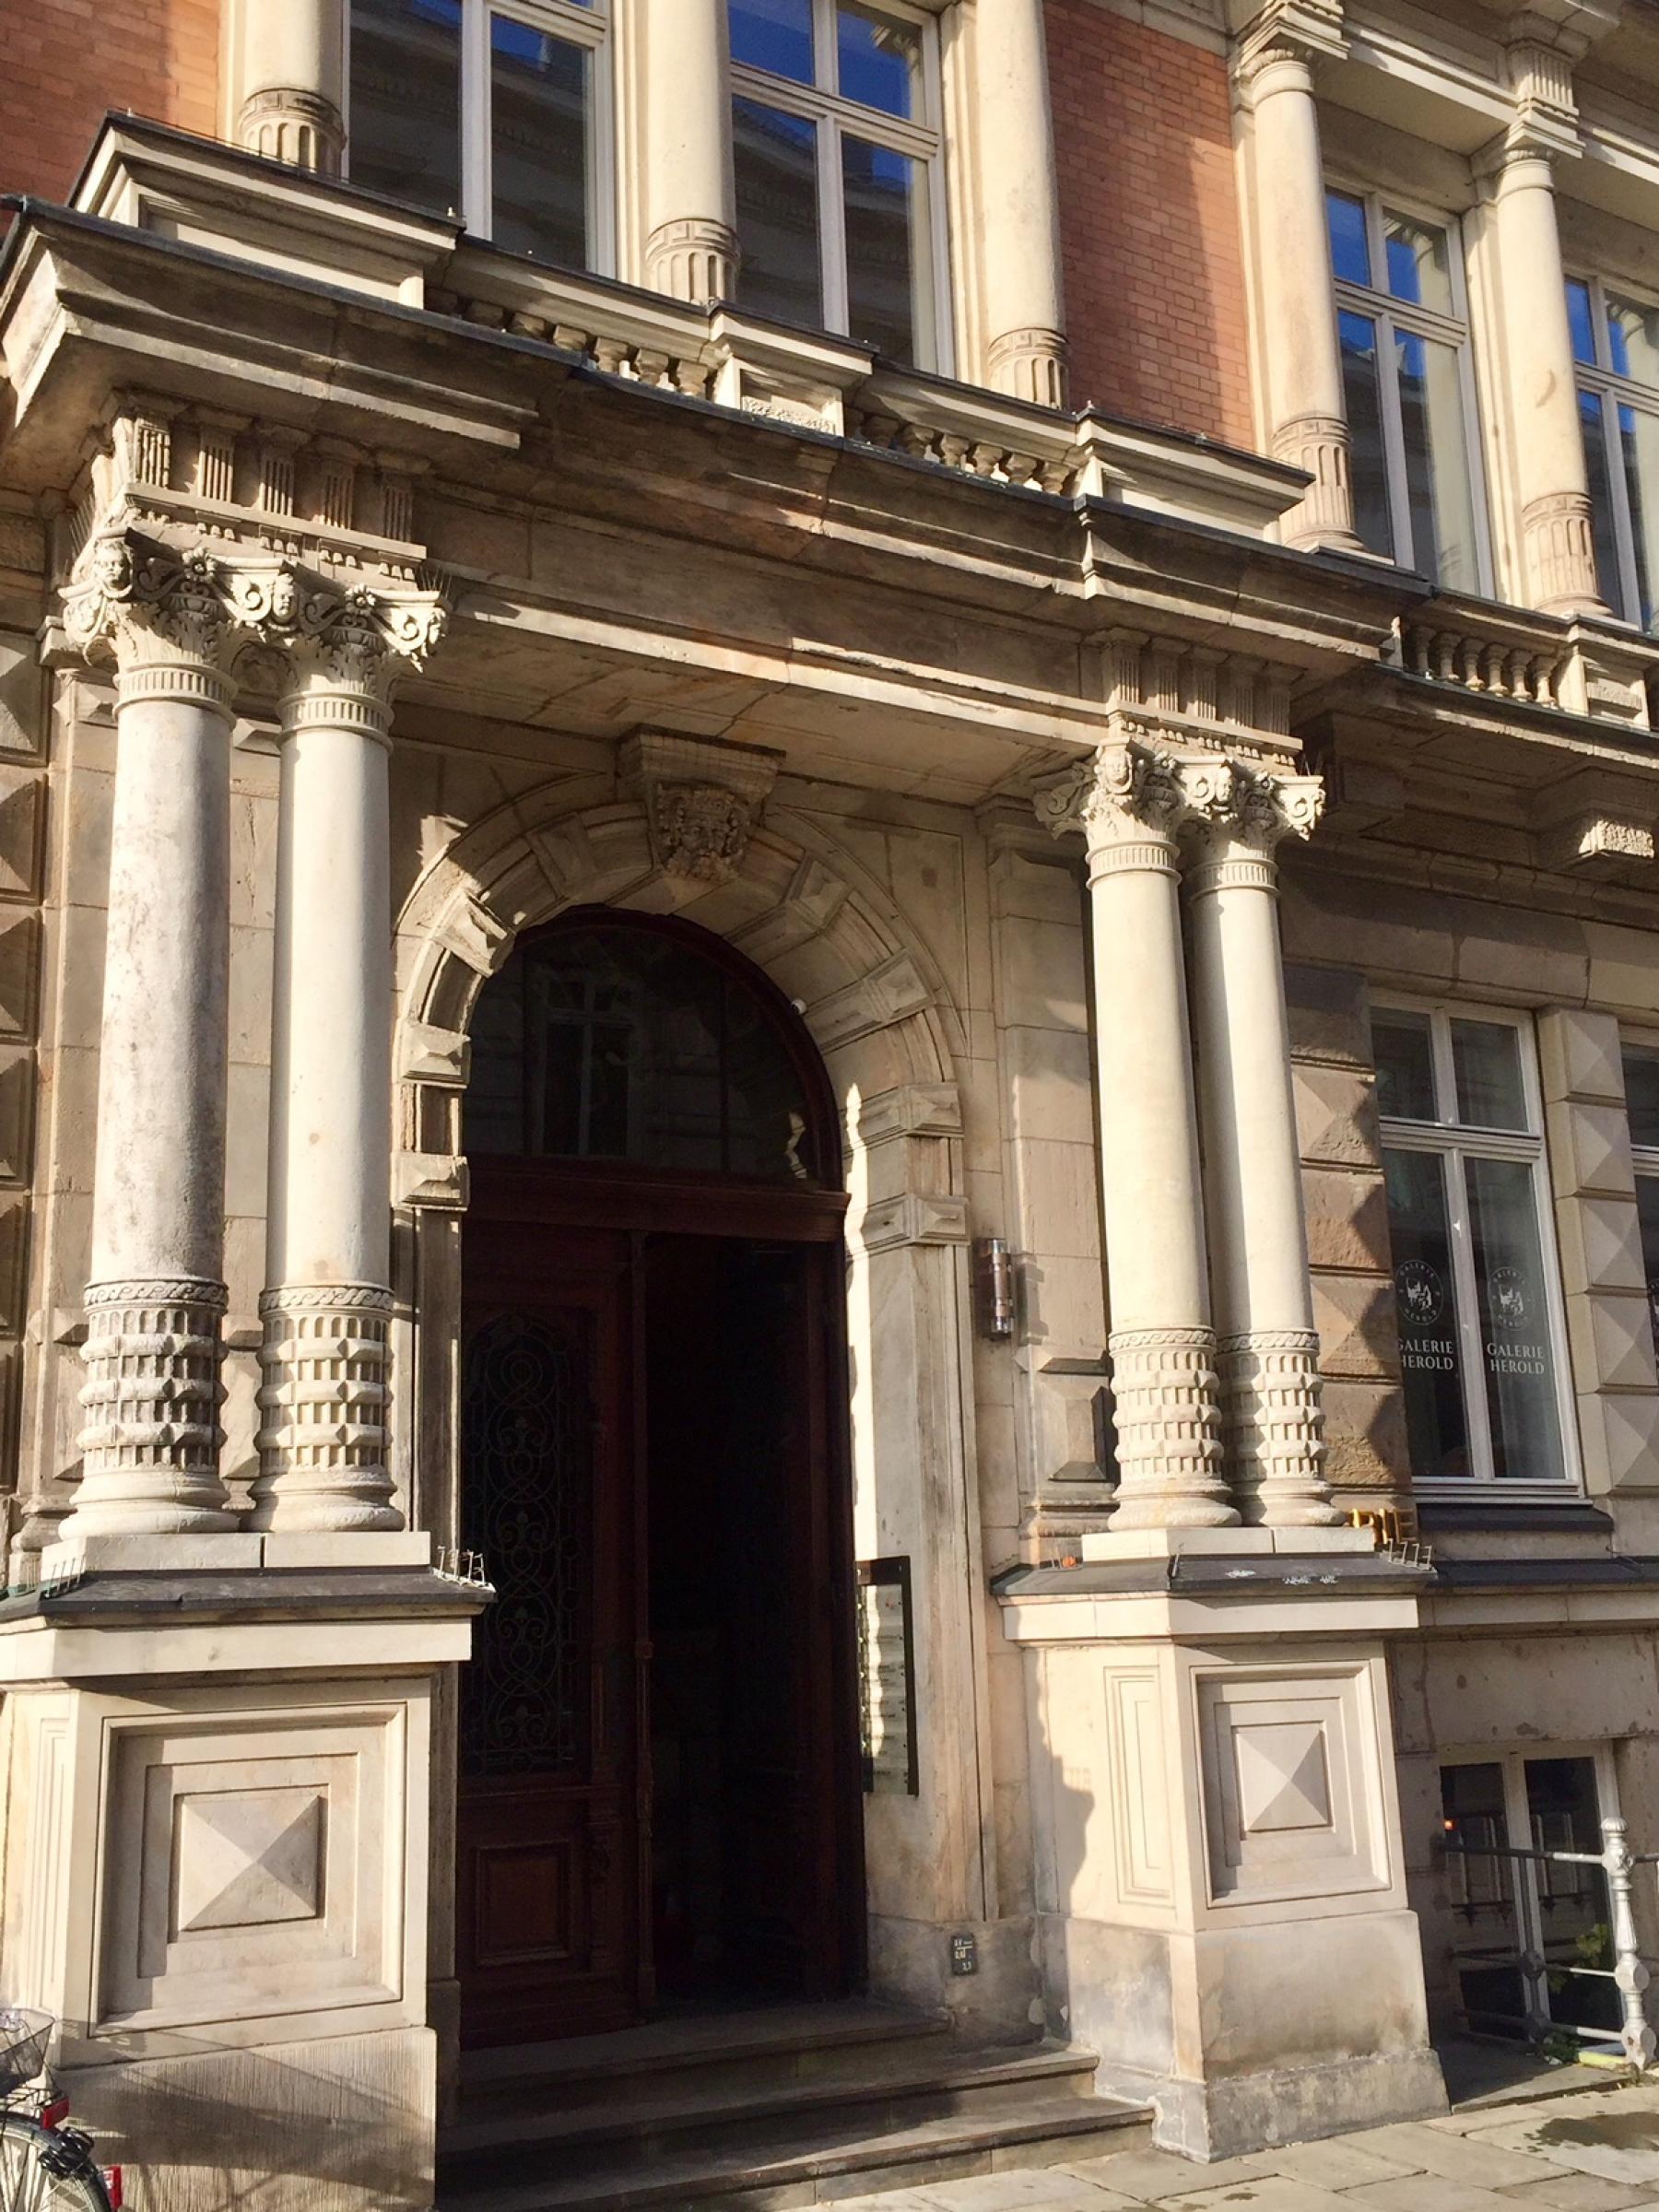 Impressive entrance area of the Office building in Hamburg